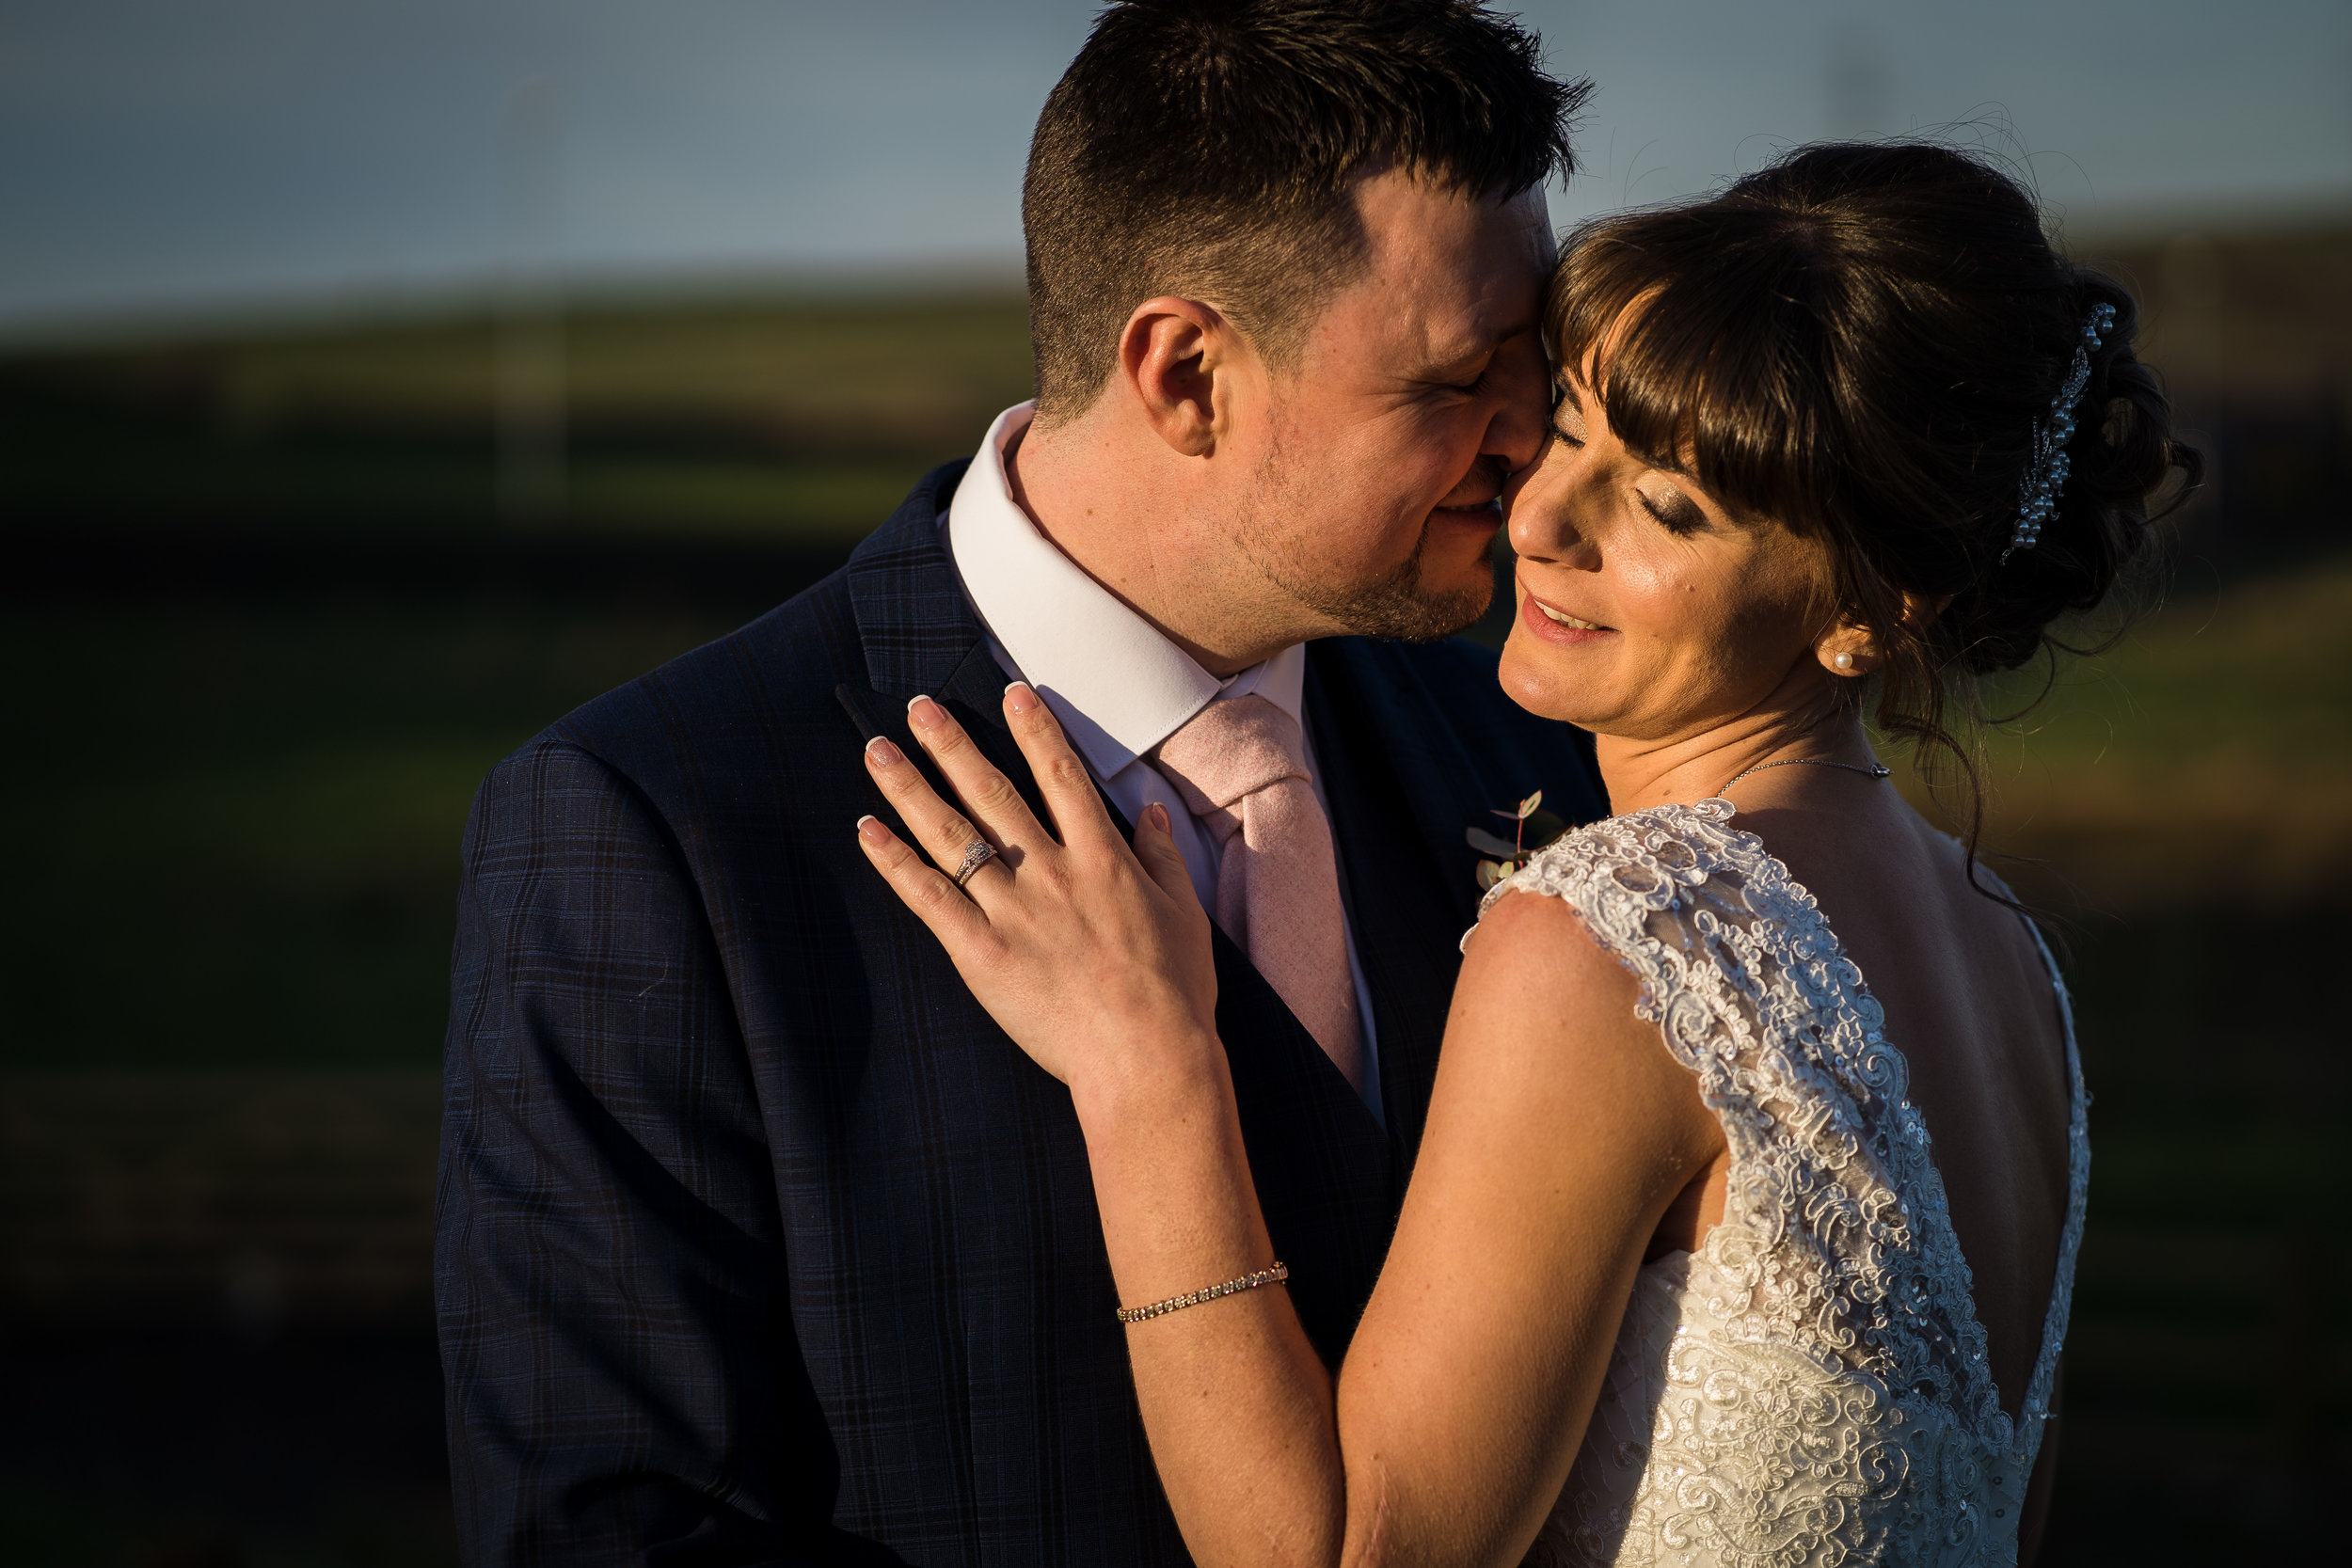 Chadderton town hall wedding 439-2.jpg